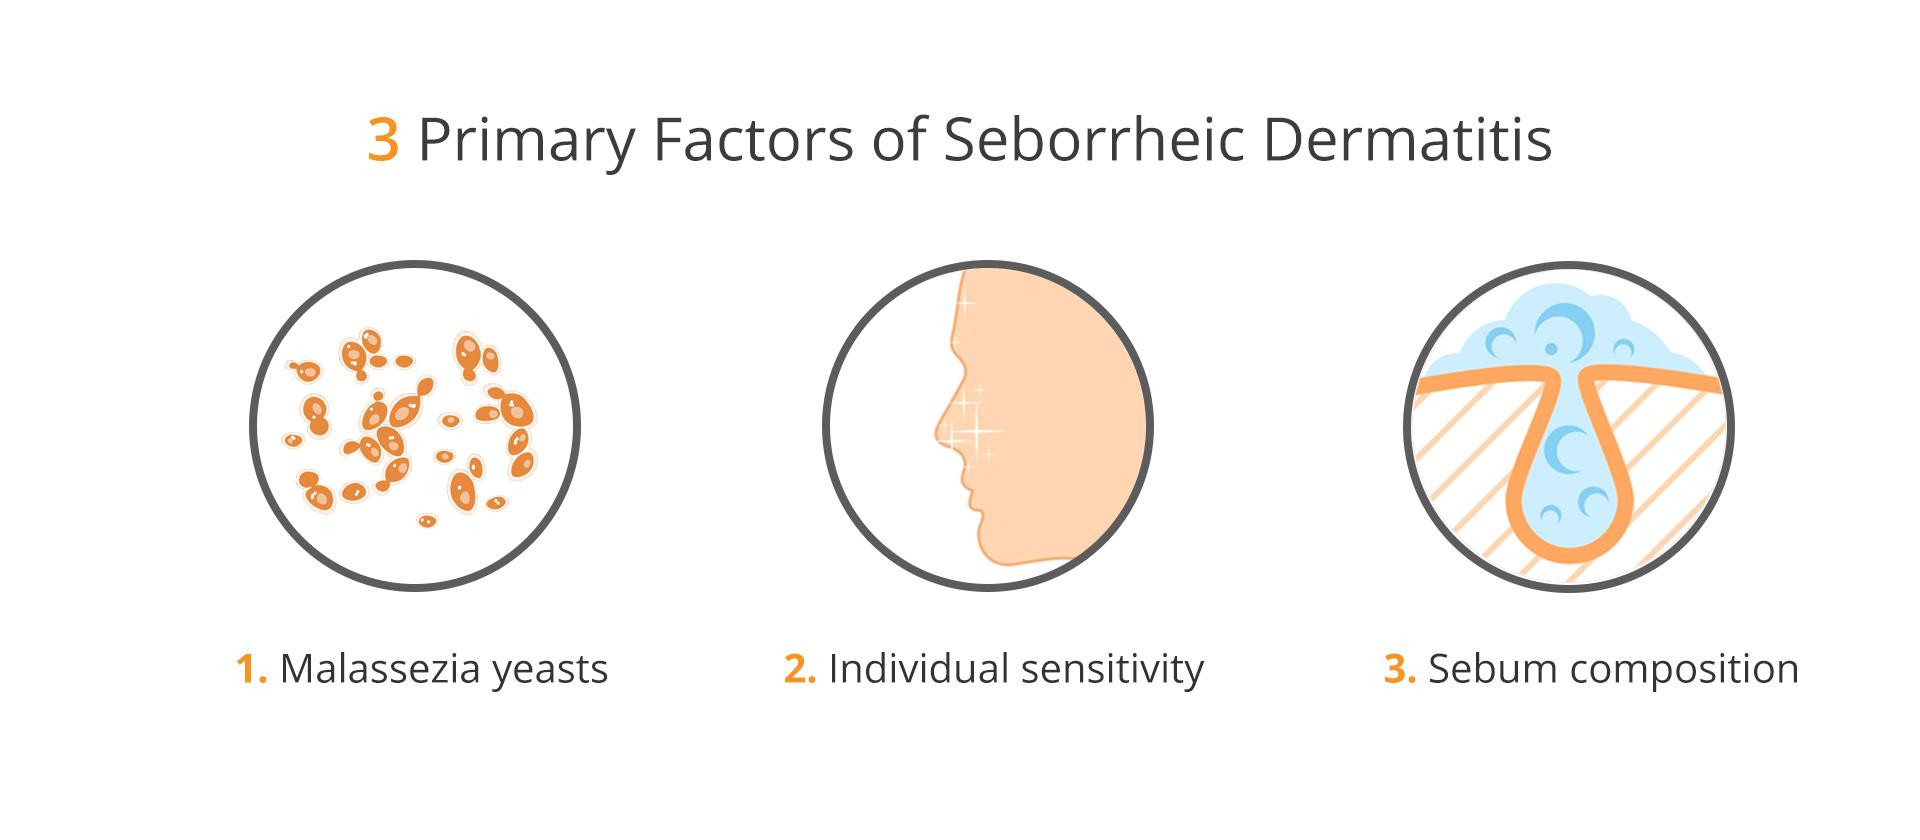 A visual representation of the 3 primary factors of seborrheic dermatitis (malassezia yeasts, individual sensitivity, and sebum composition)